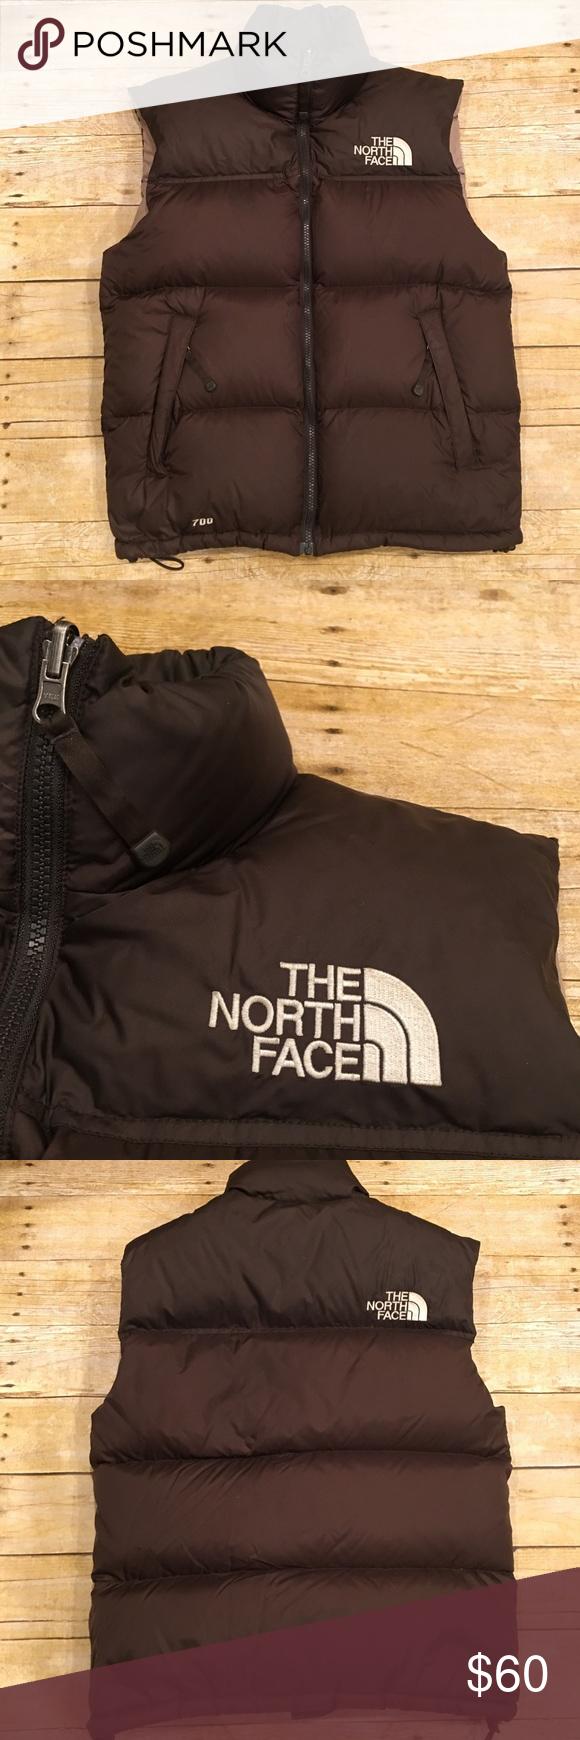 Men S The North Face Nuptse Vest Brown North Face Nuptse Vest North Face Nuptse The North Face [ 1740 x 580 Pixel ]